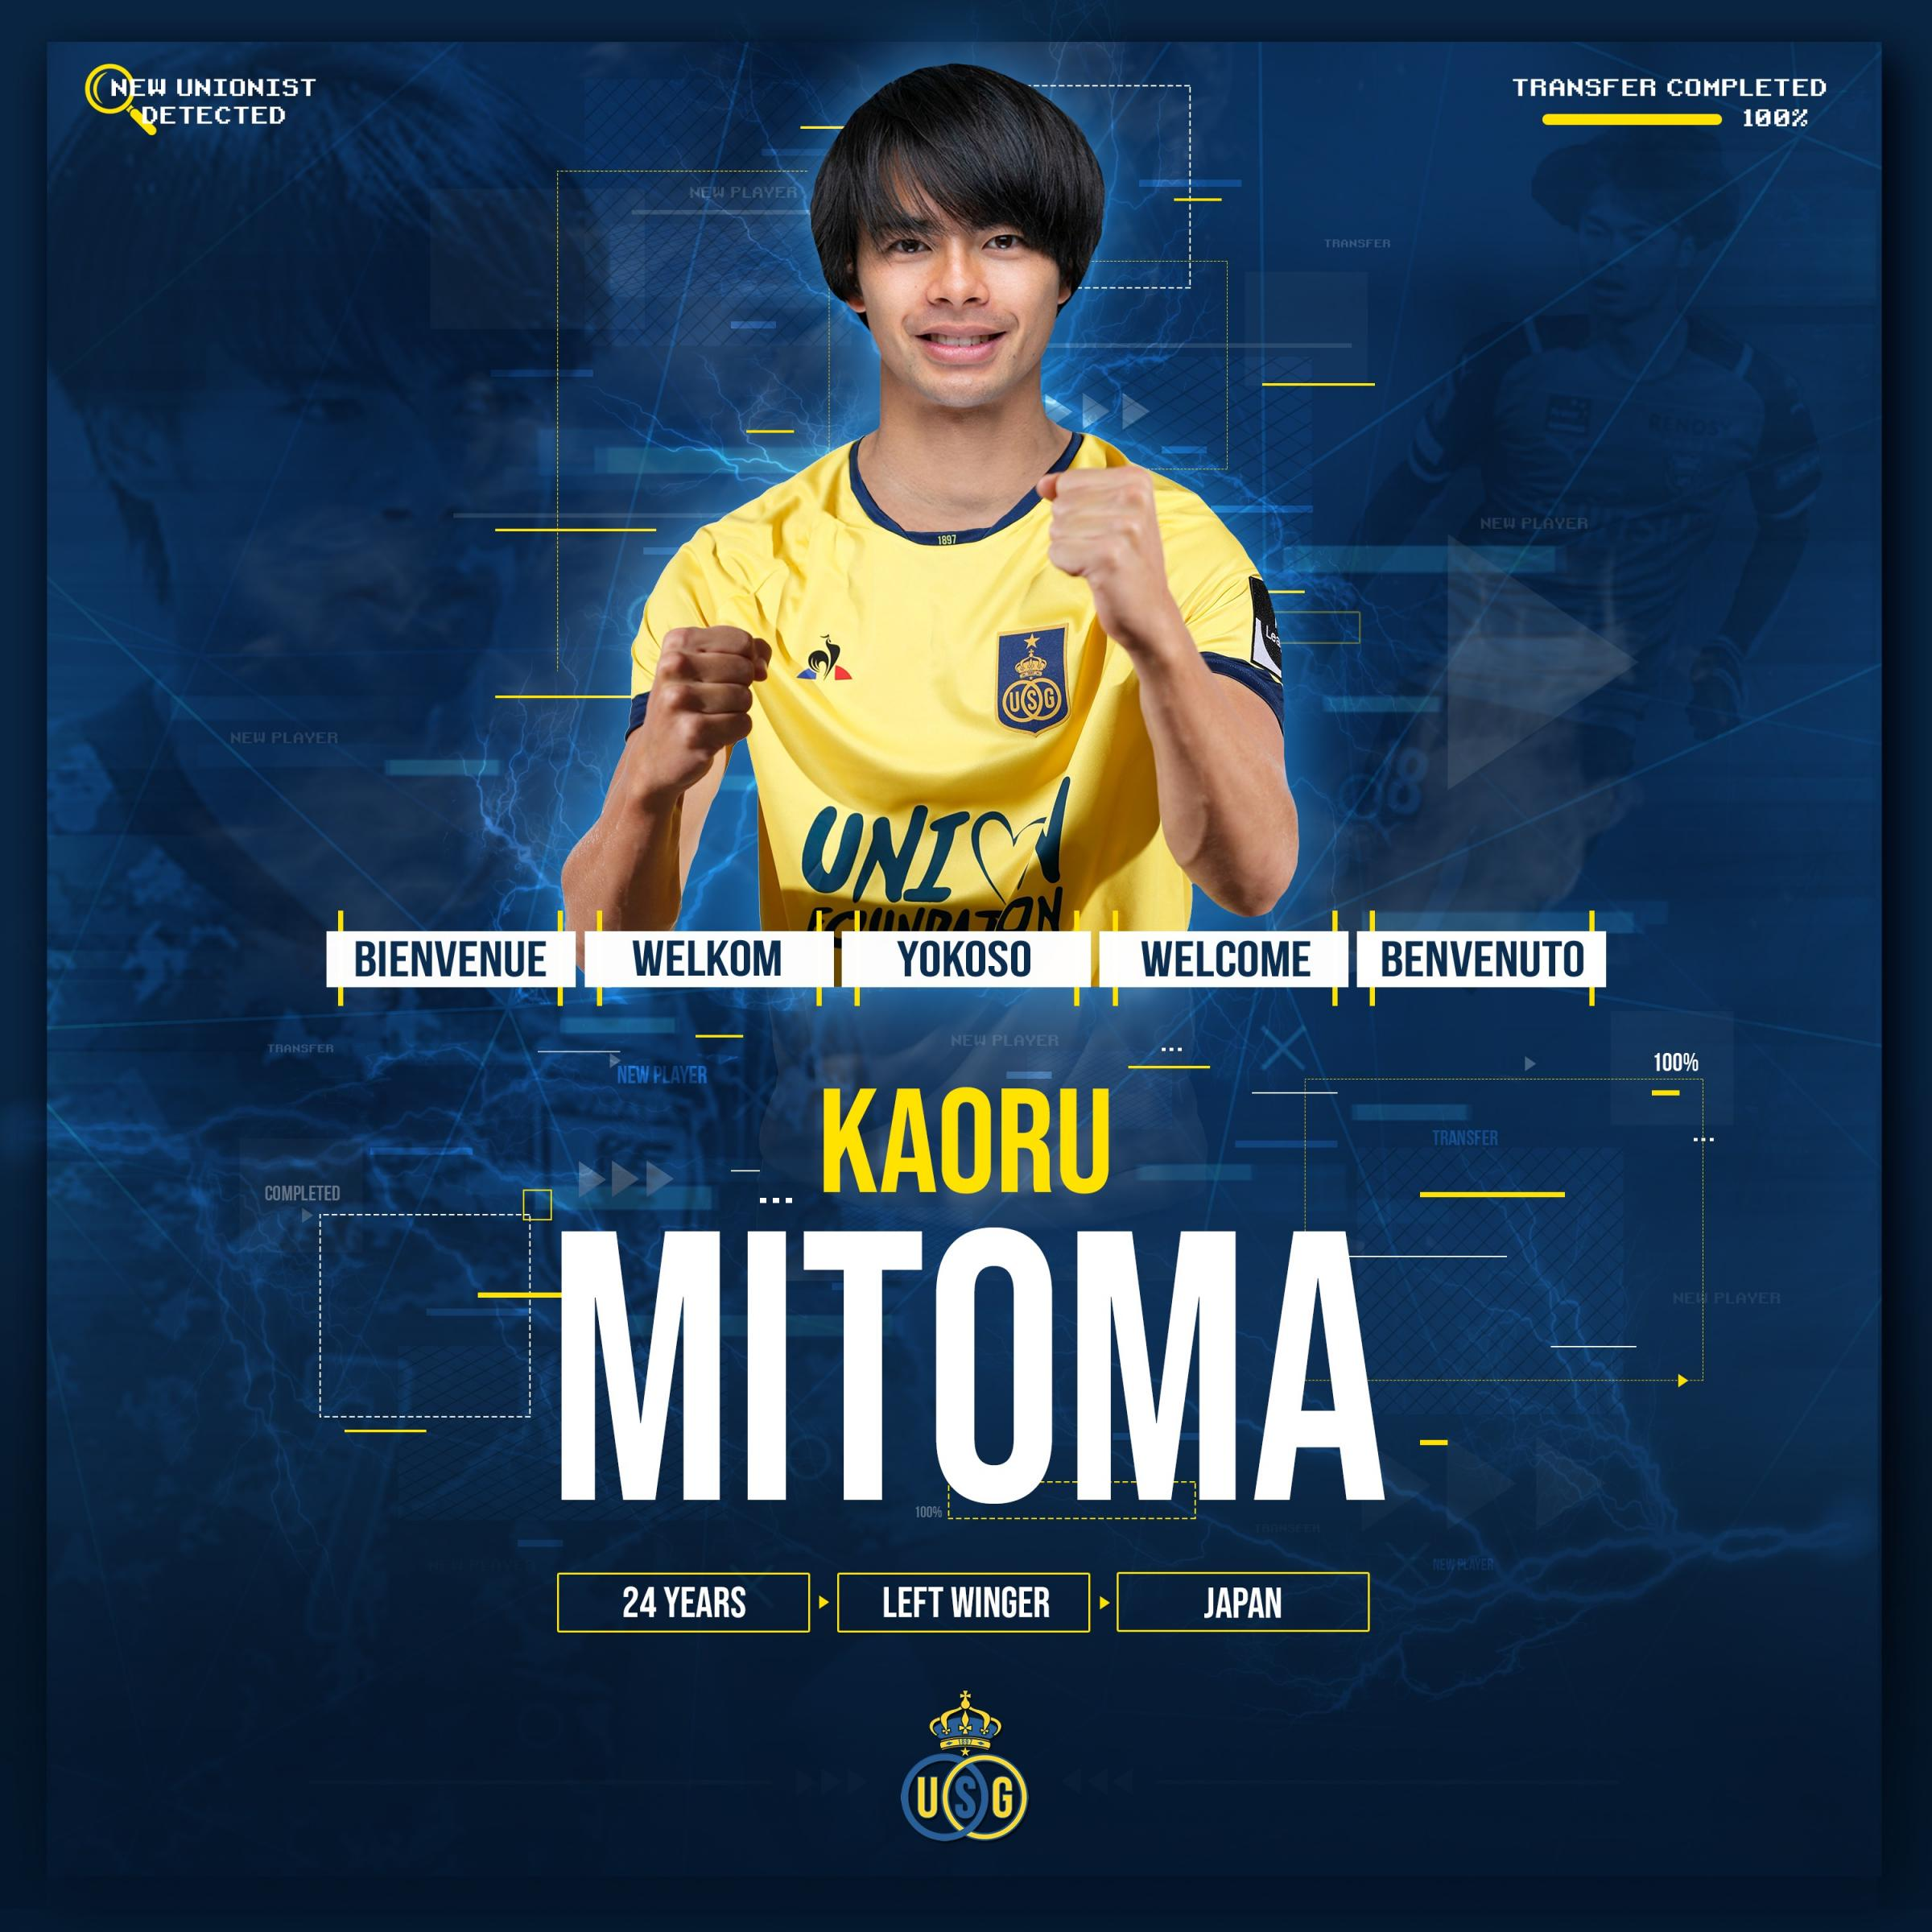 Brighton's hopes for Japan international Kaoru Mitoma